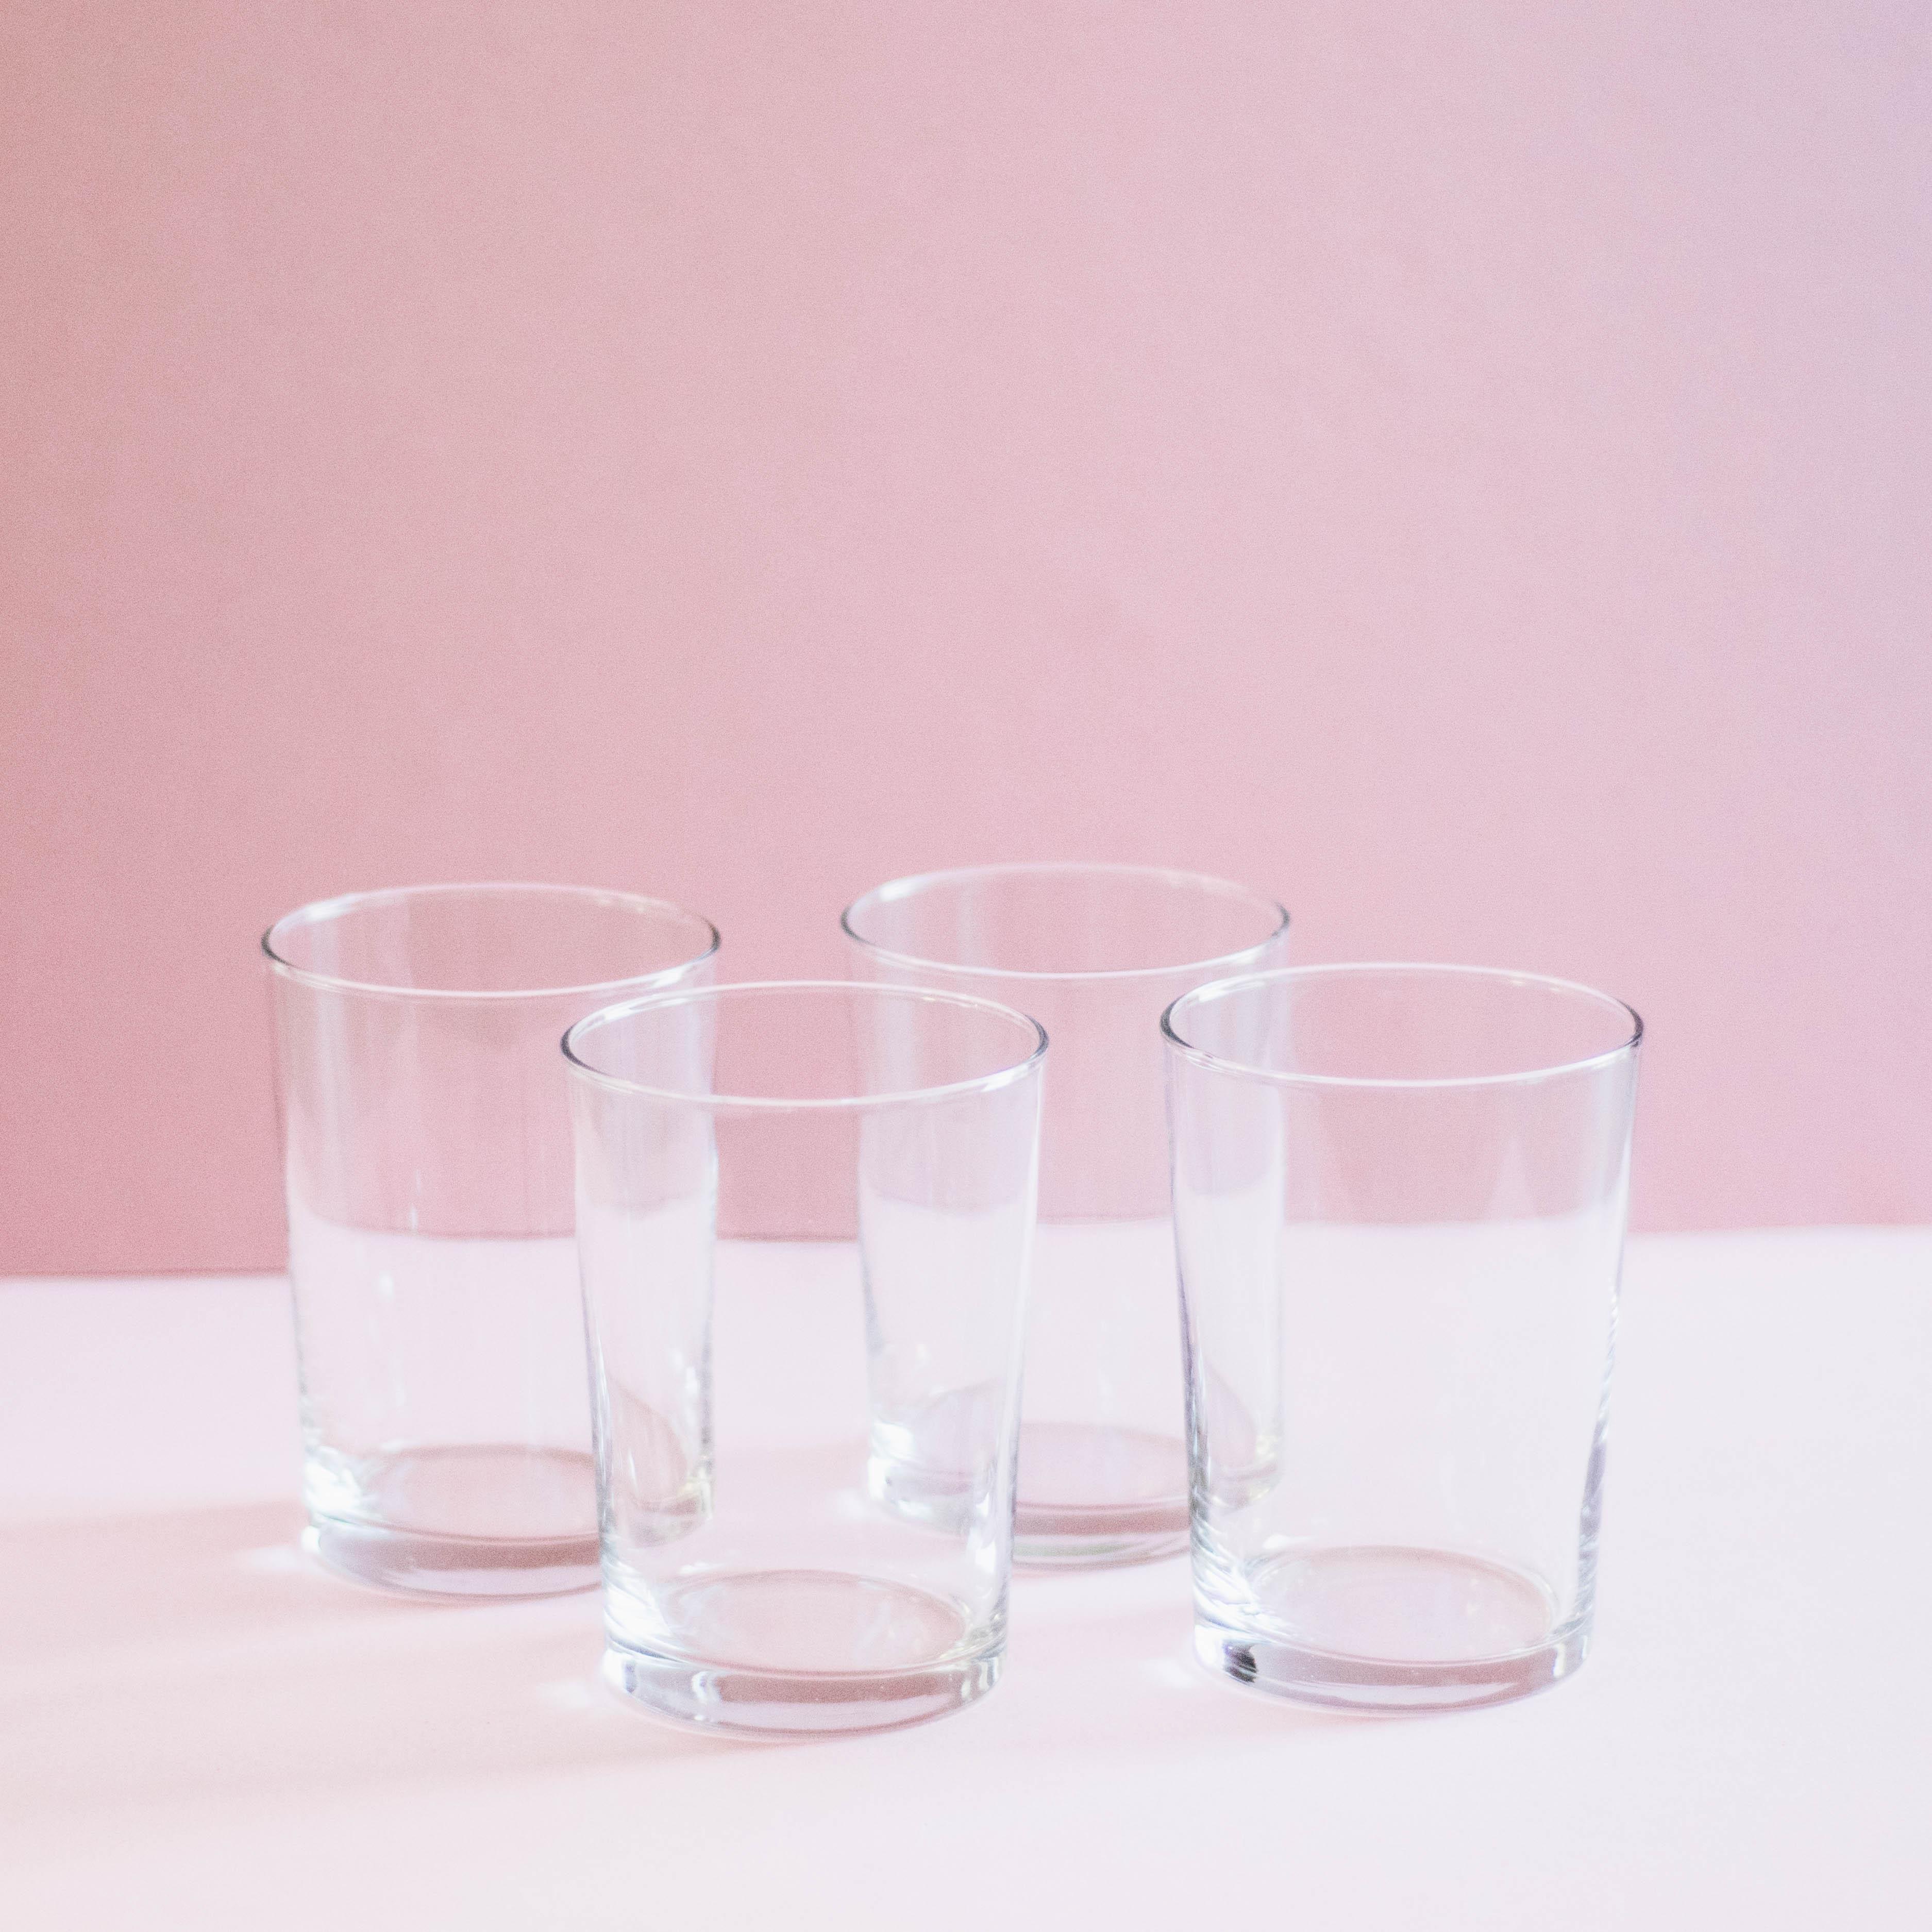 Bodega Maxi Glasses